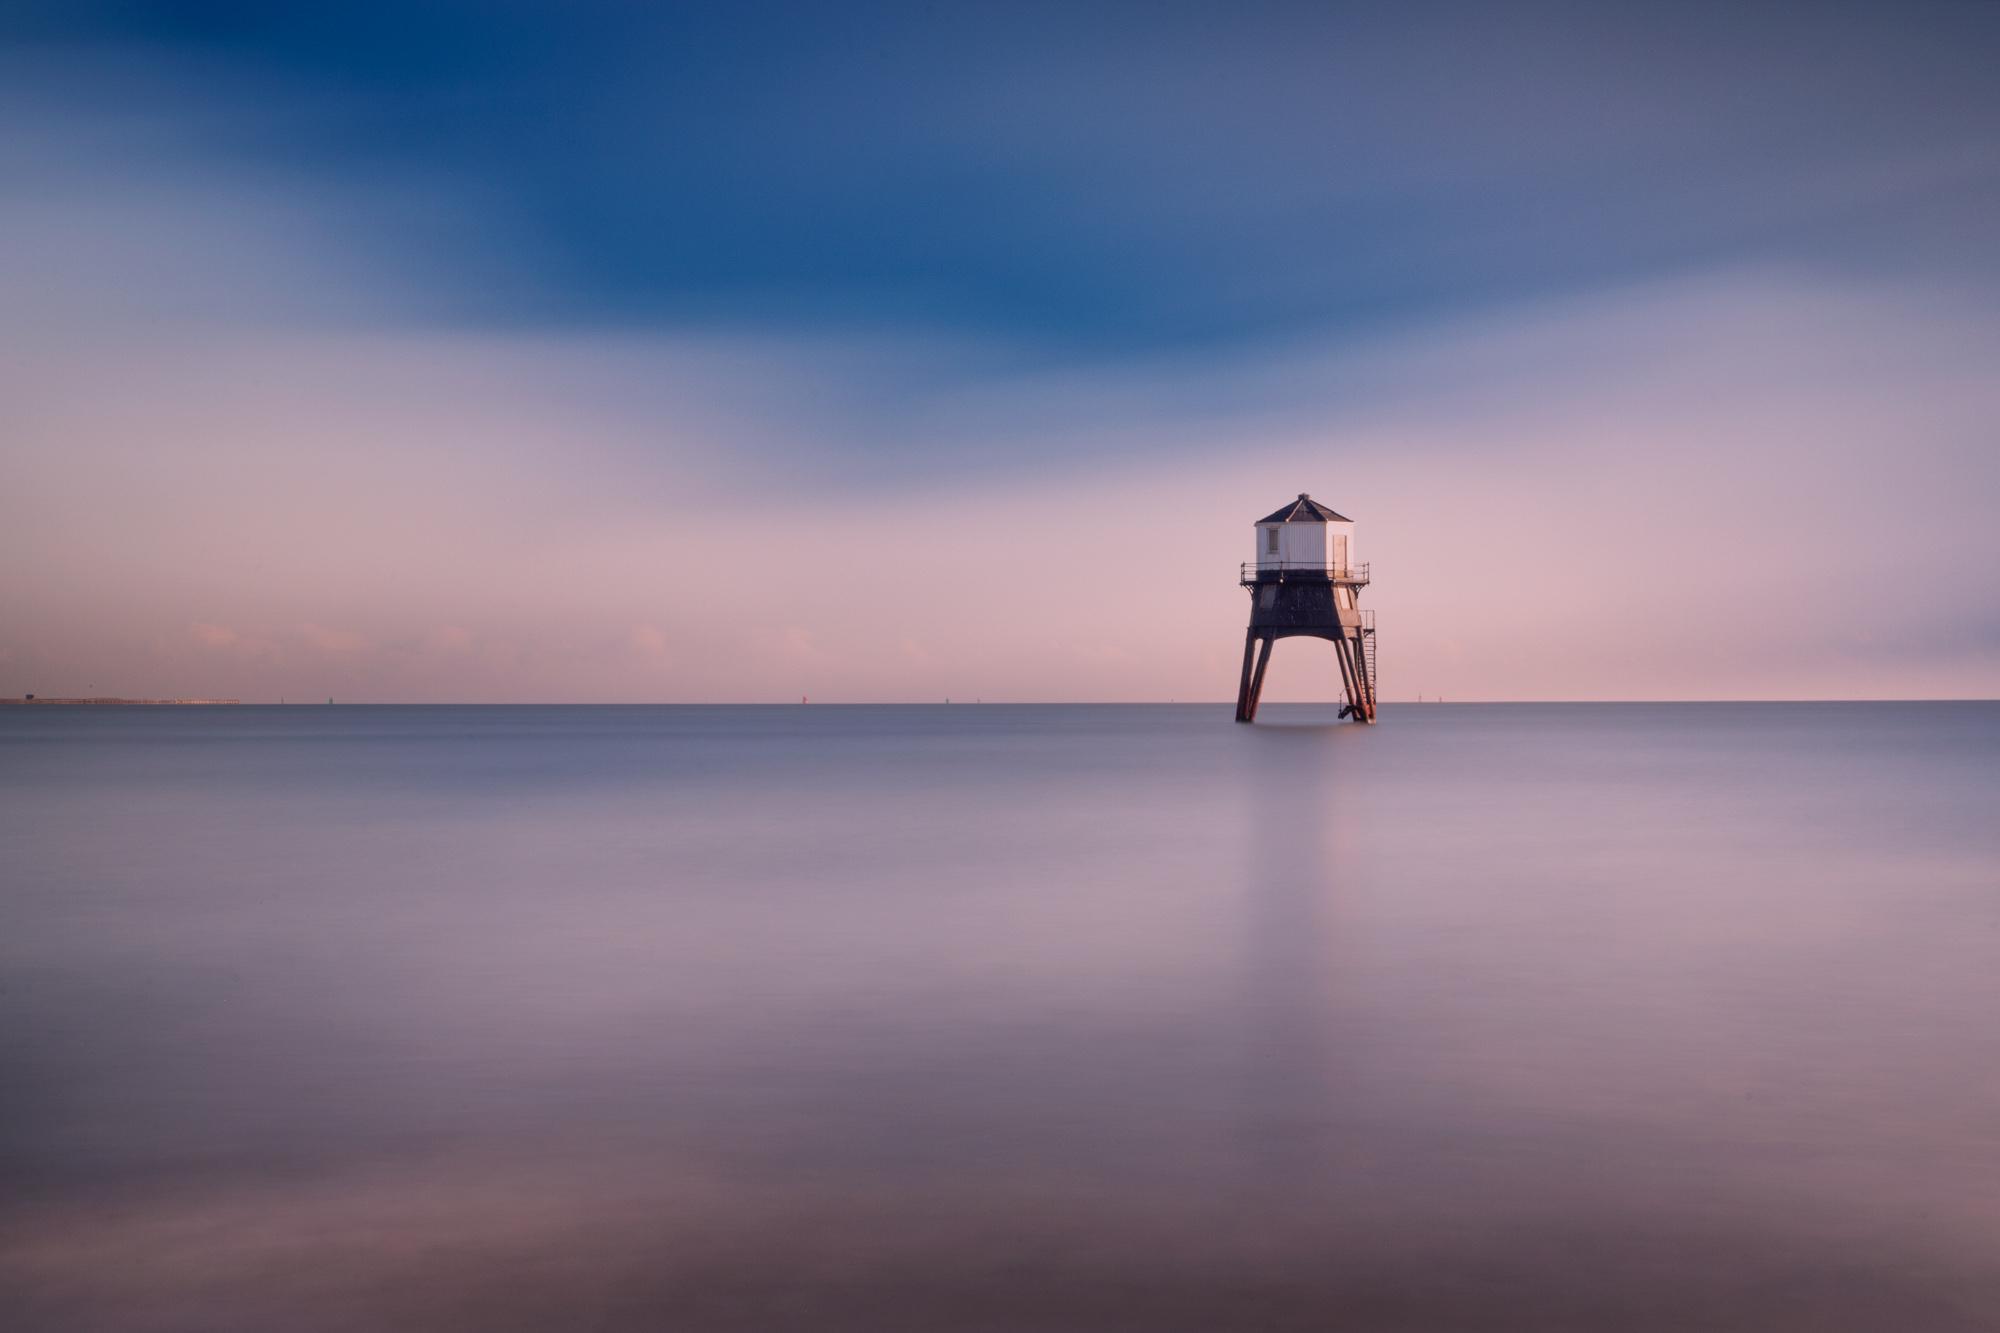 antonyz long exposure landscape photograph of Dovercourt lighthouse at sunrise in essex uk